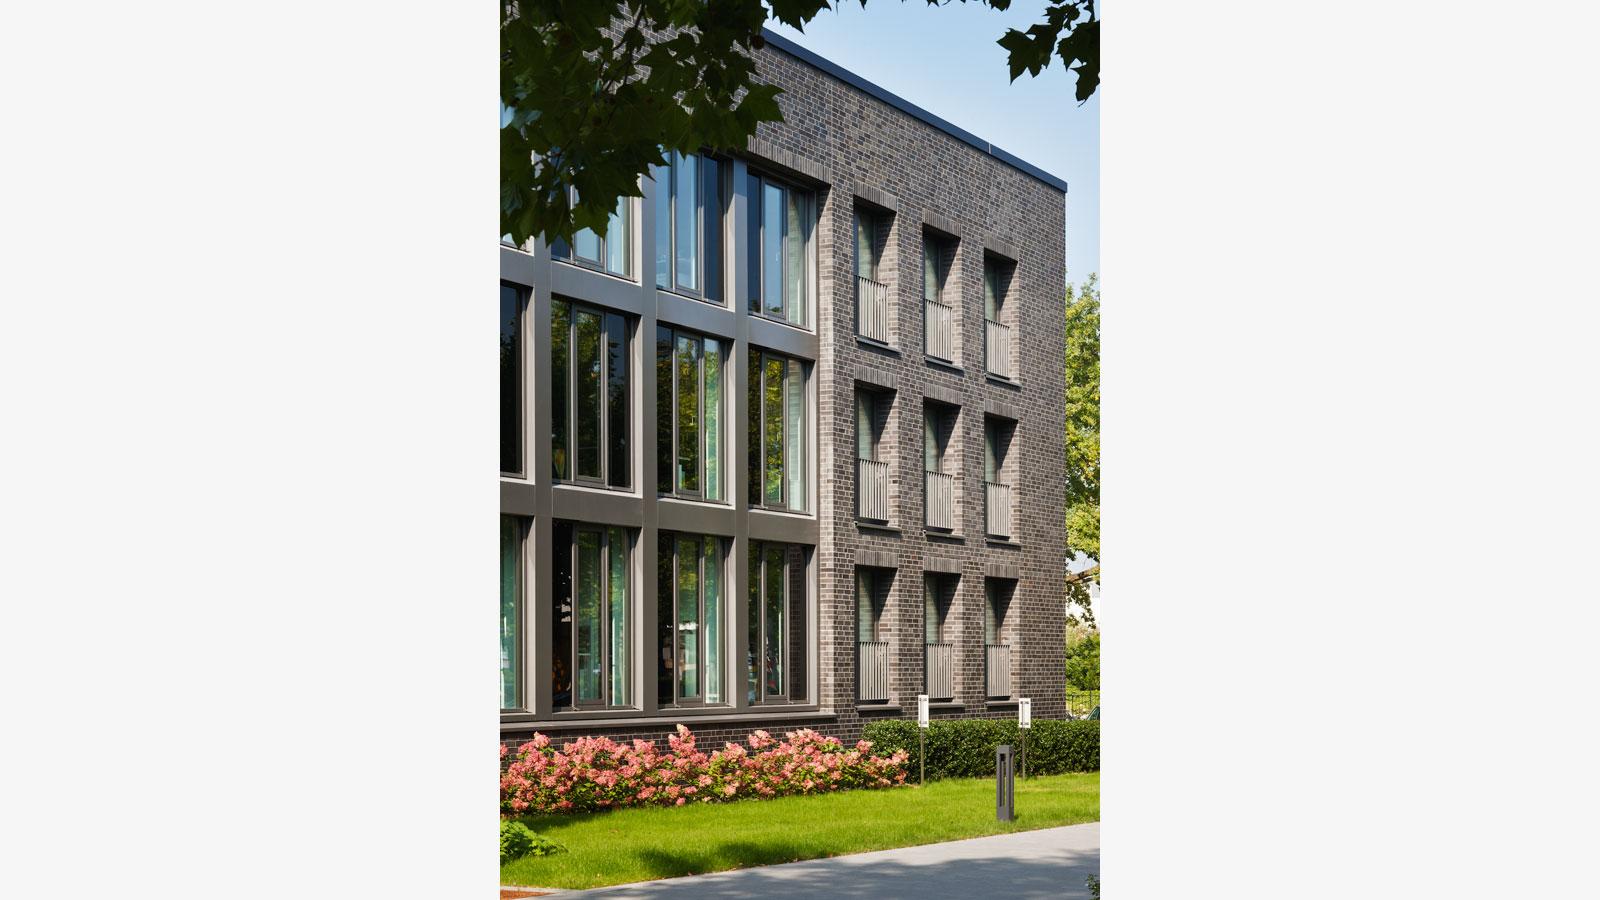 Bürogebäude Godesberger Allee - Koenigs Rütter Architekten Bonn